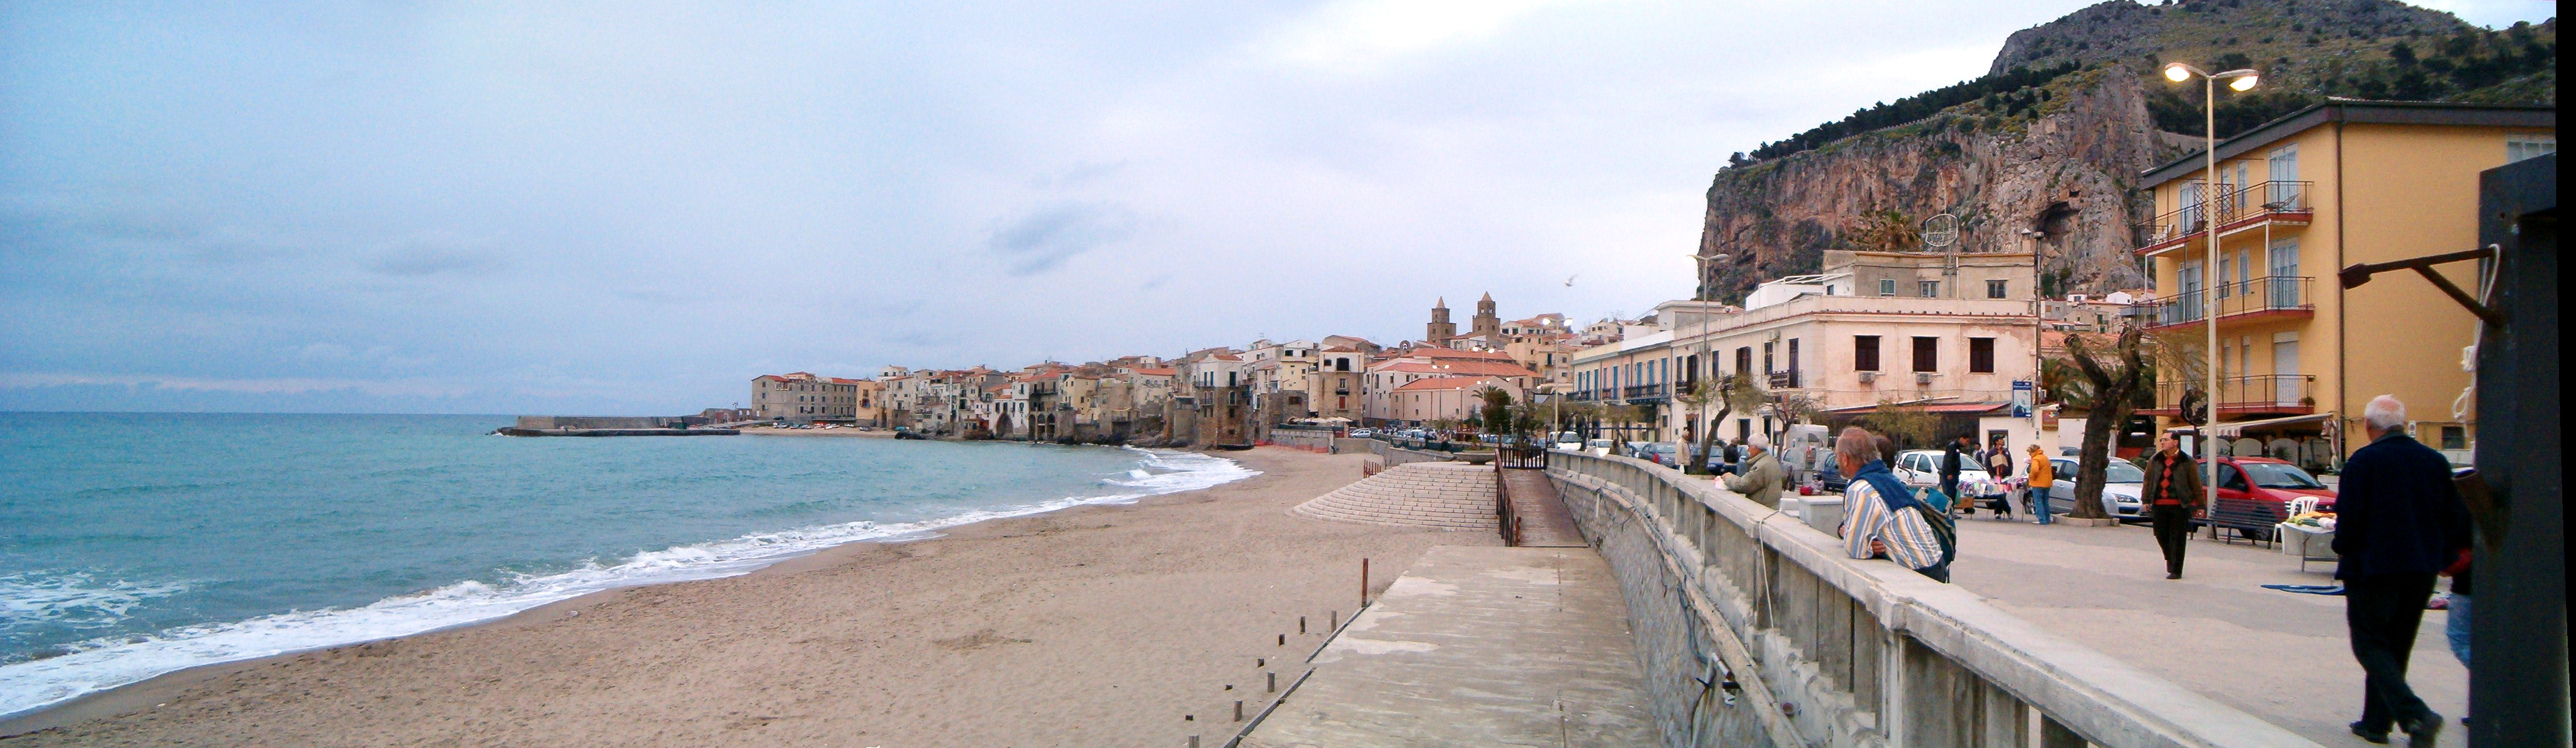 Hotel In Bari Italien